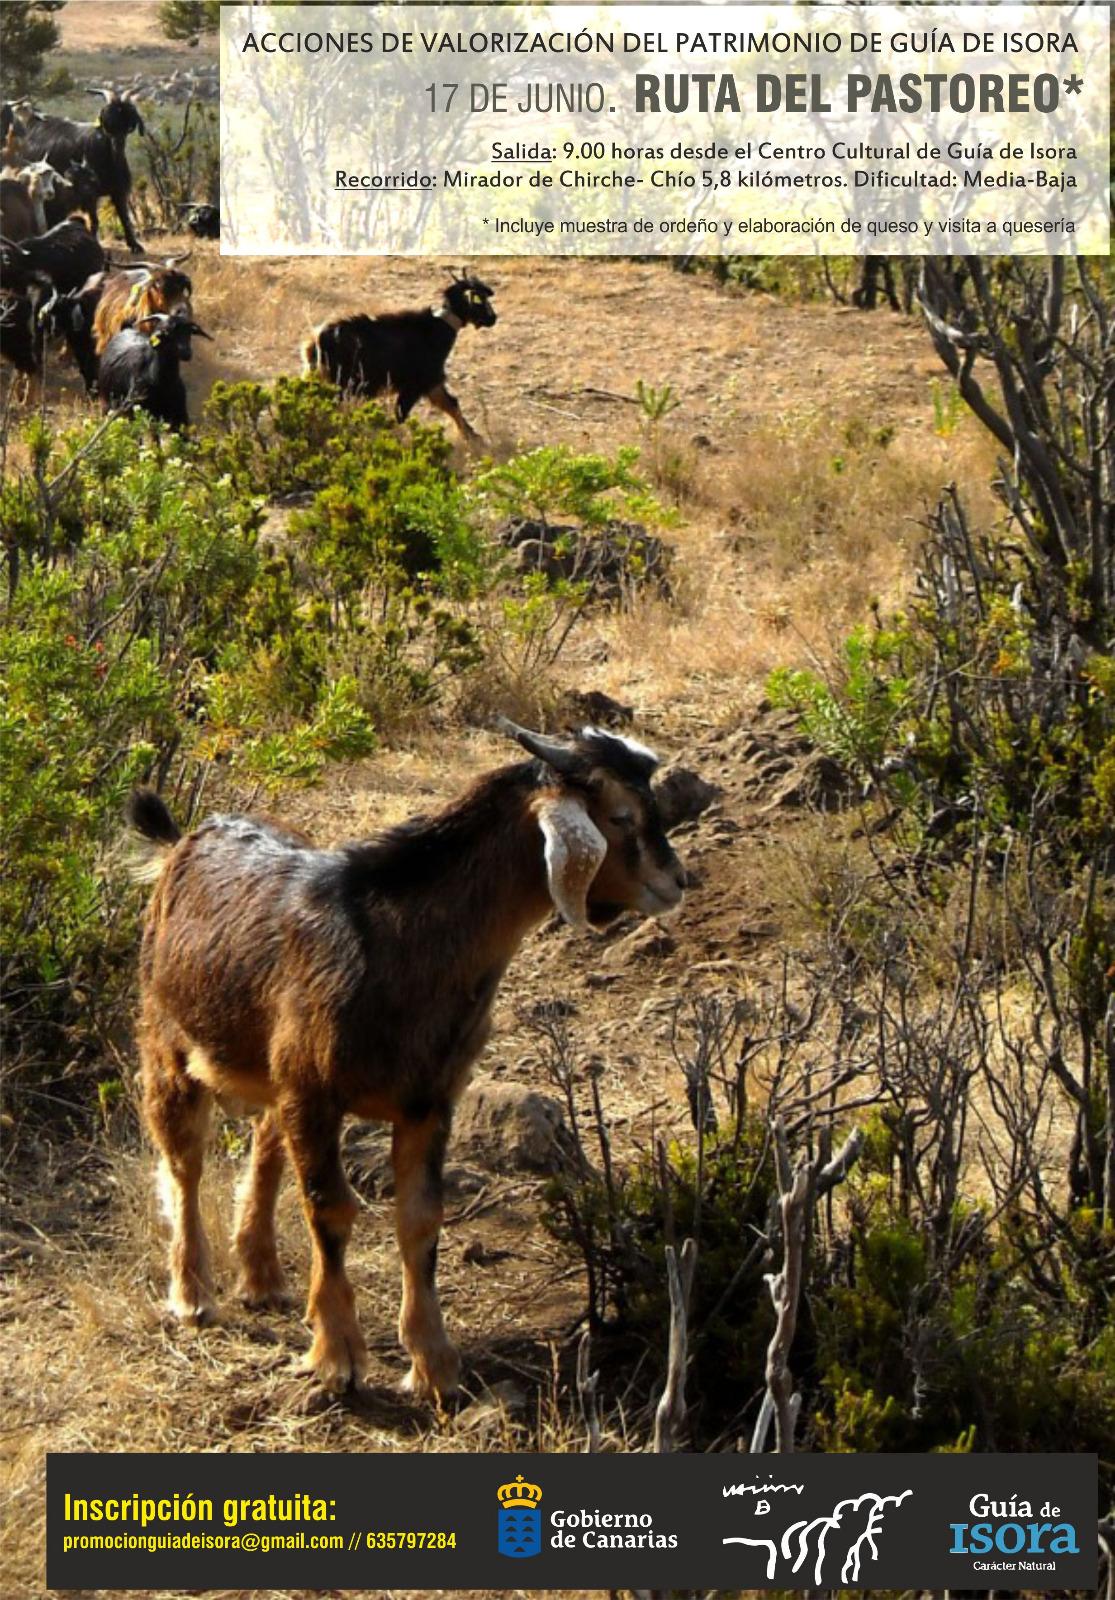 Ruta del Pastoreo